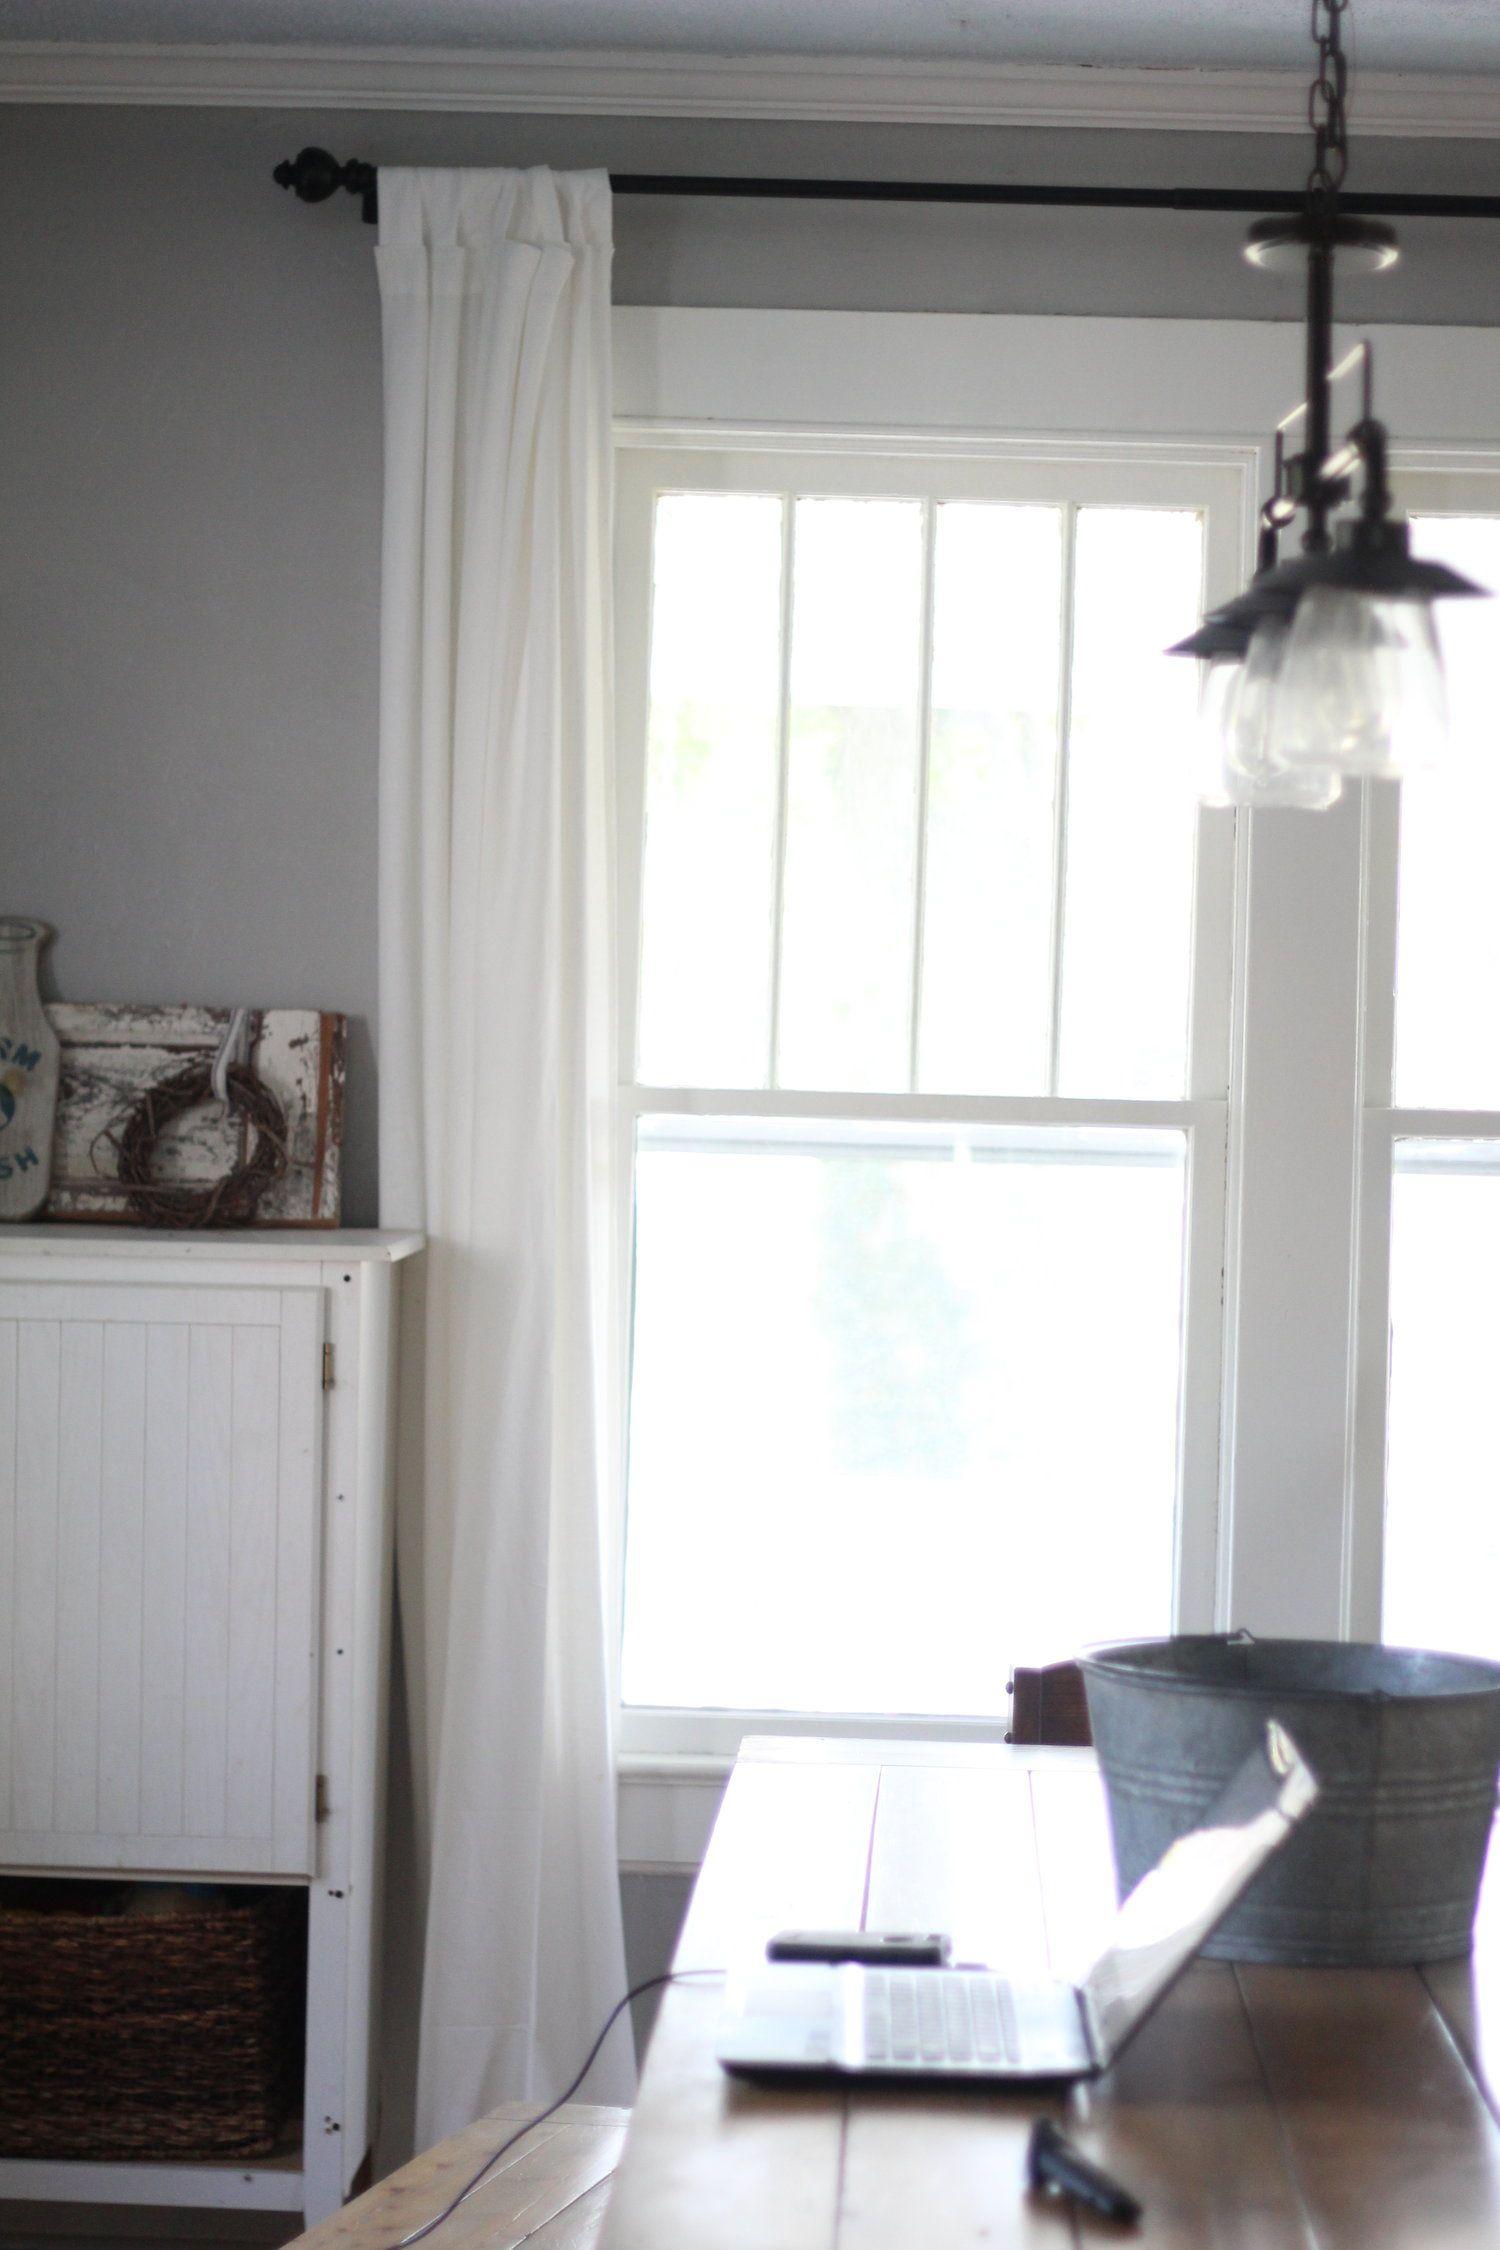 My Favorite Farmhouse Finds From IKEA | Living room decor ... on Farmhouse Dining Room Curtain Ideas  id=18362